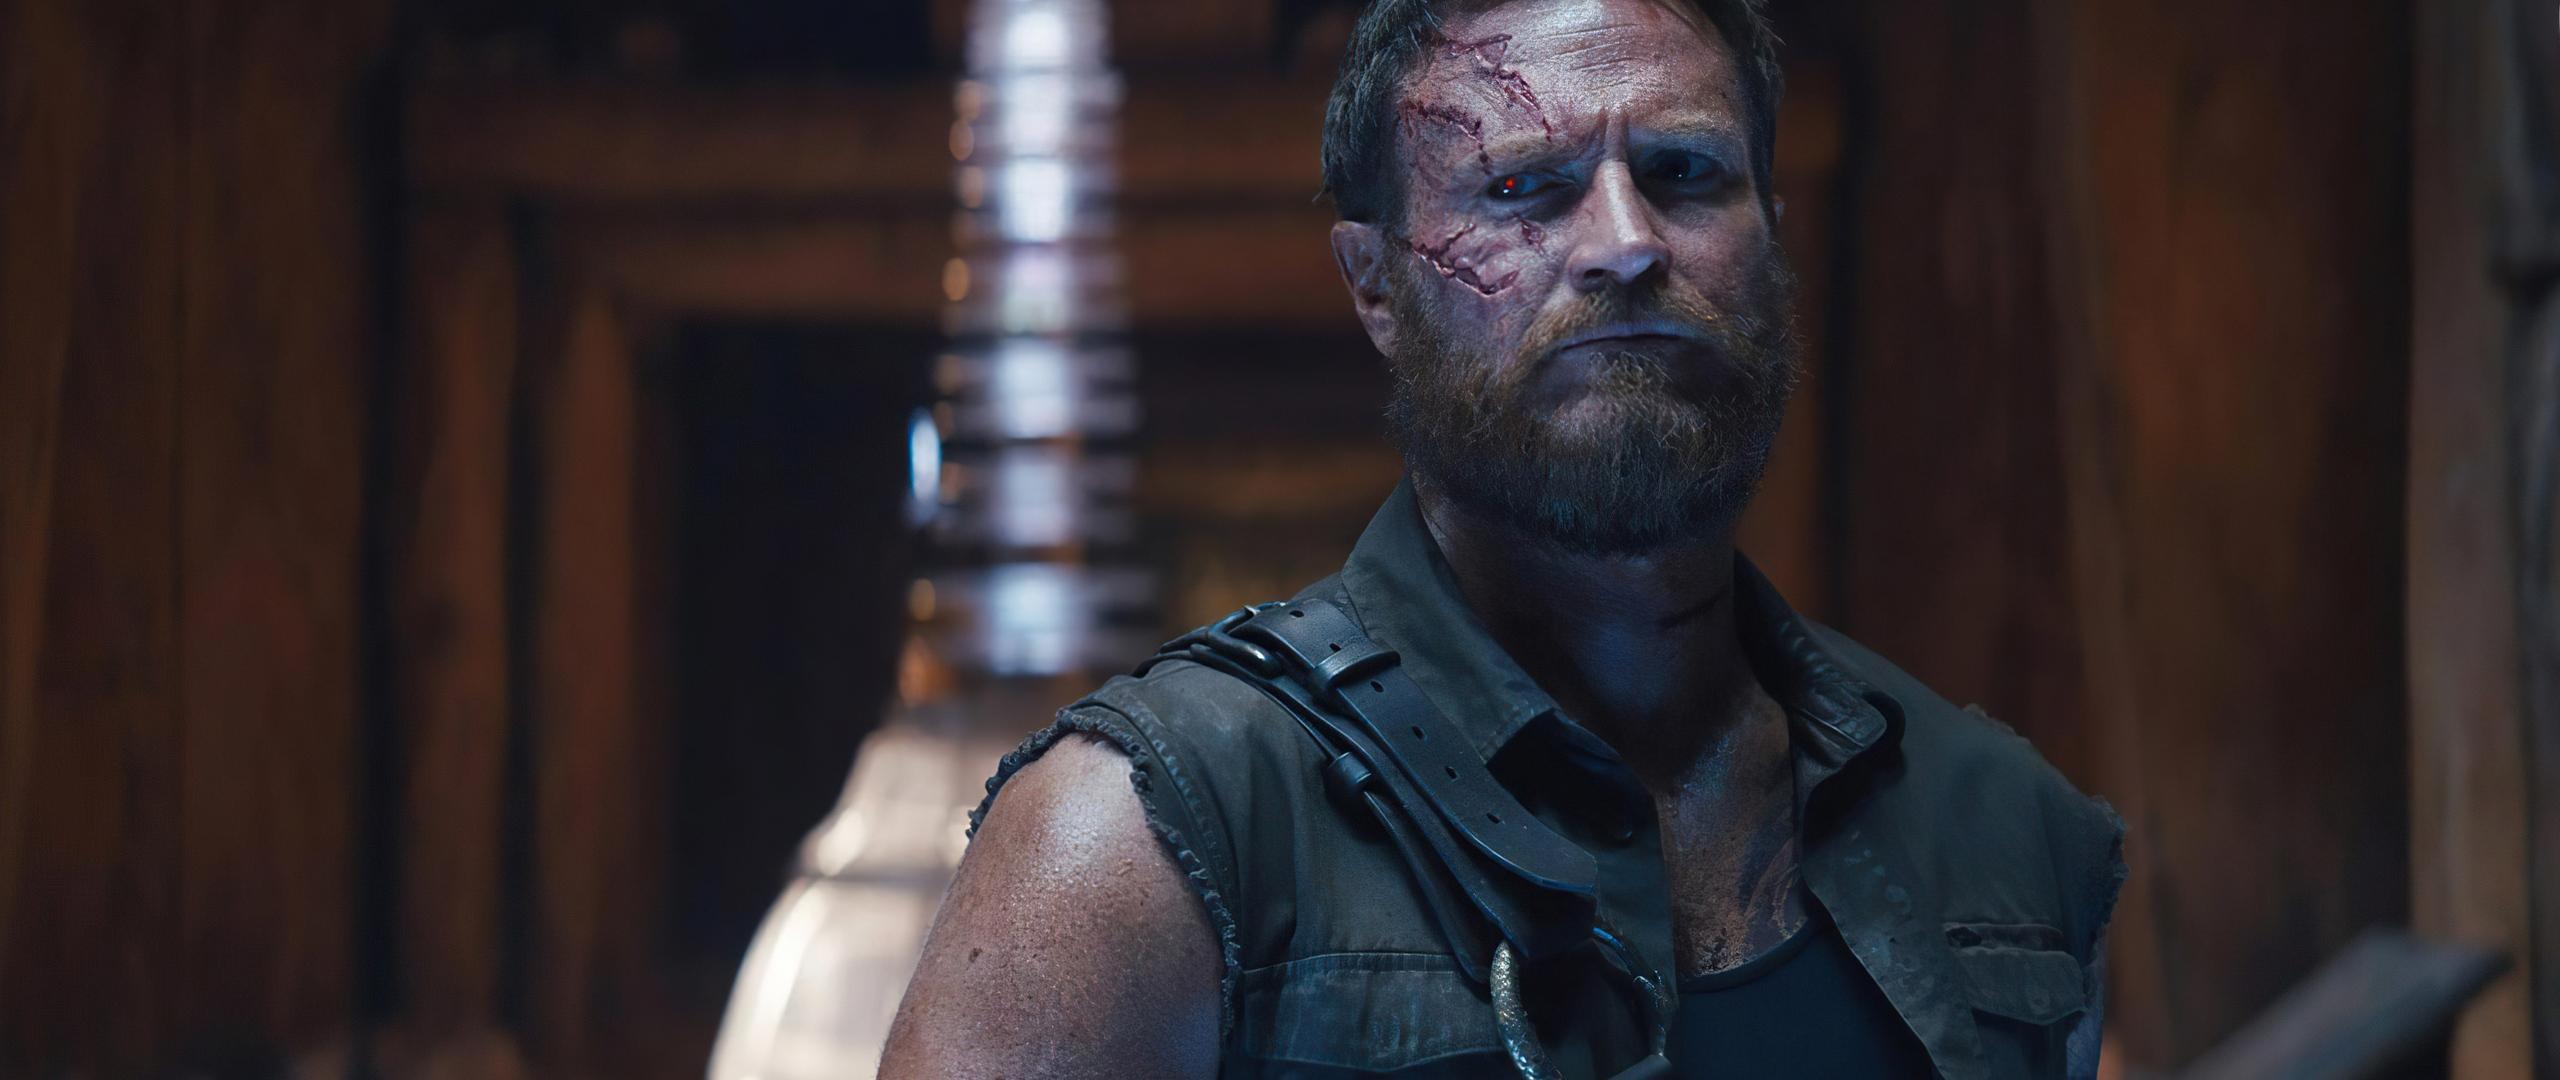 kano-mortal-kombat-movie-2021-gj.jpg